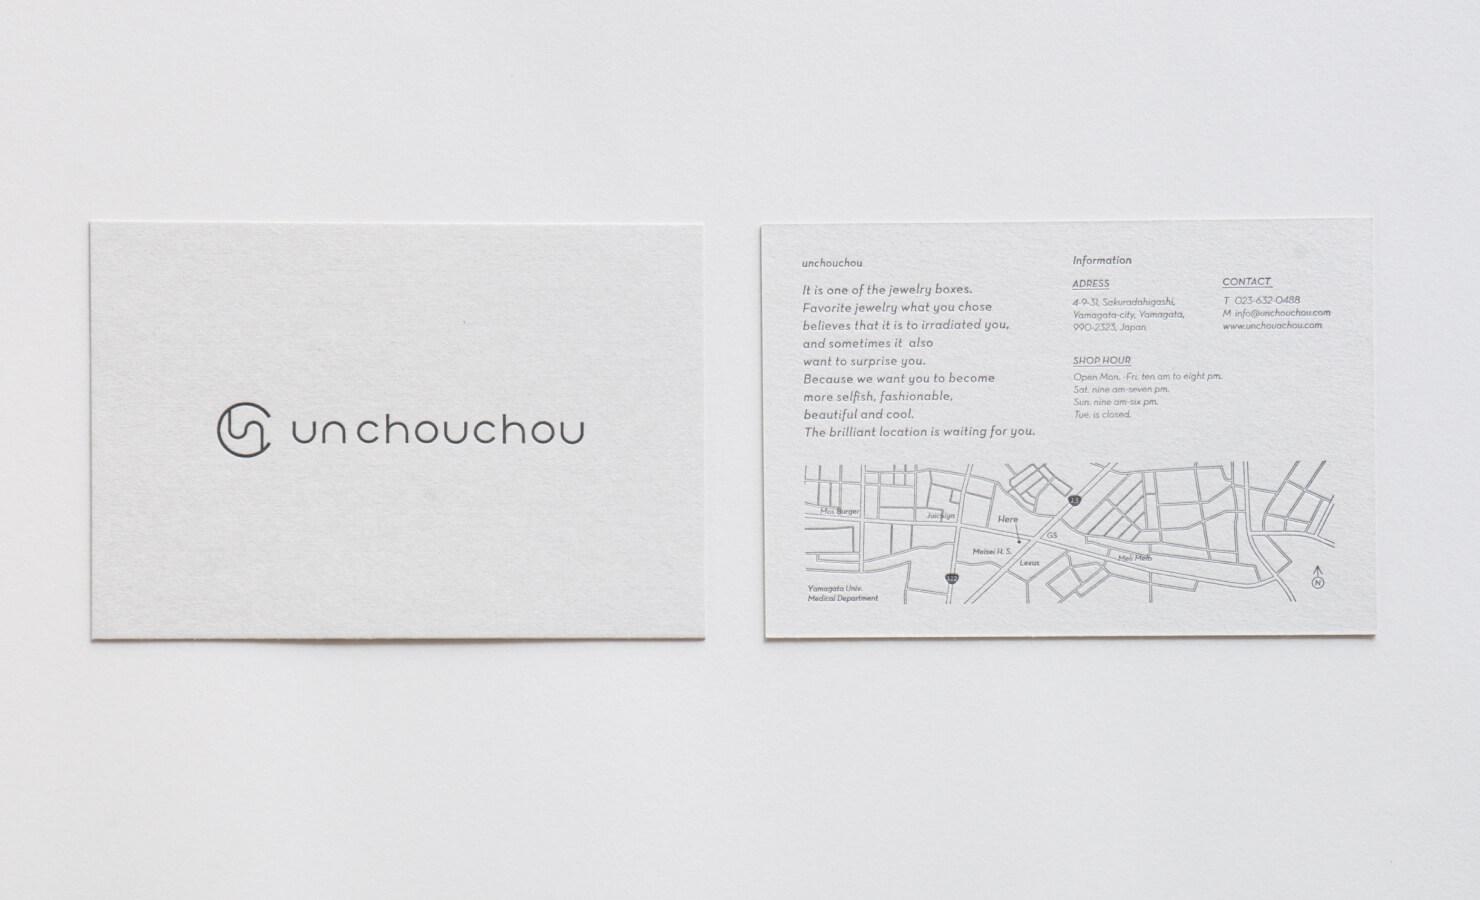 unchouchou ショップカード